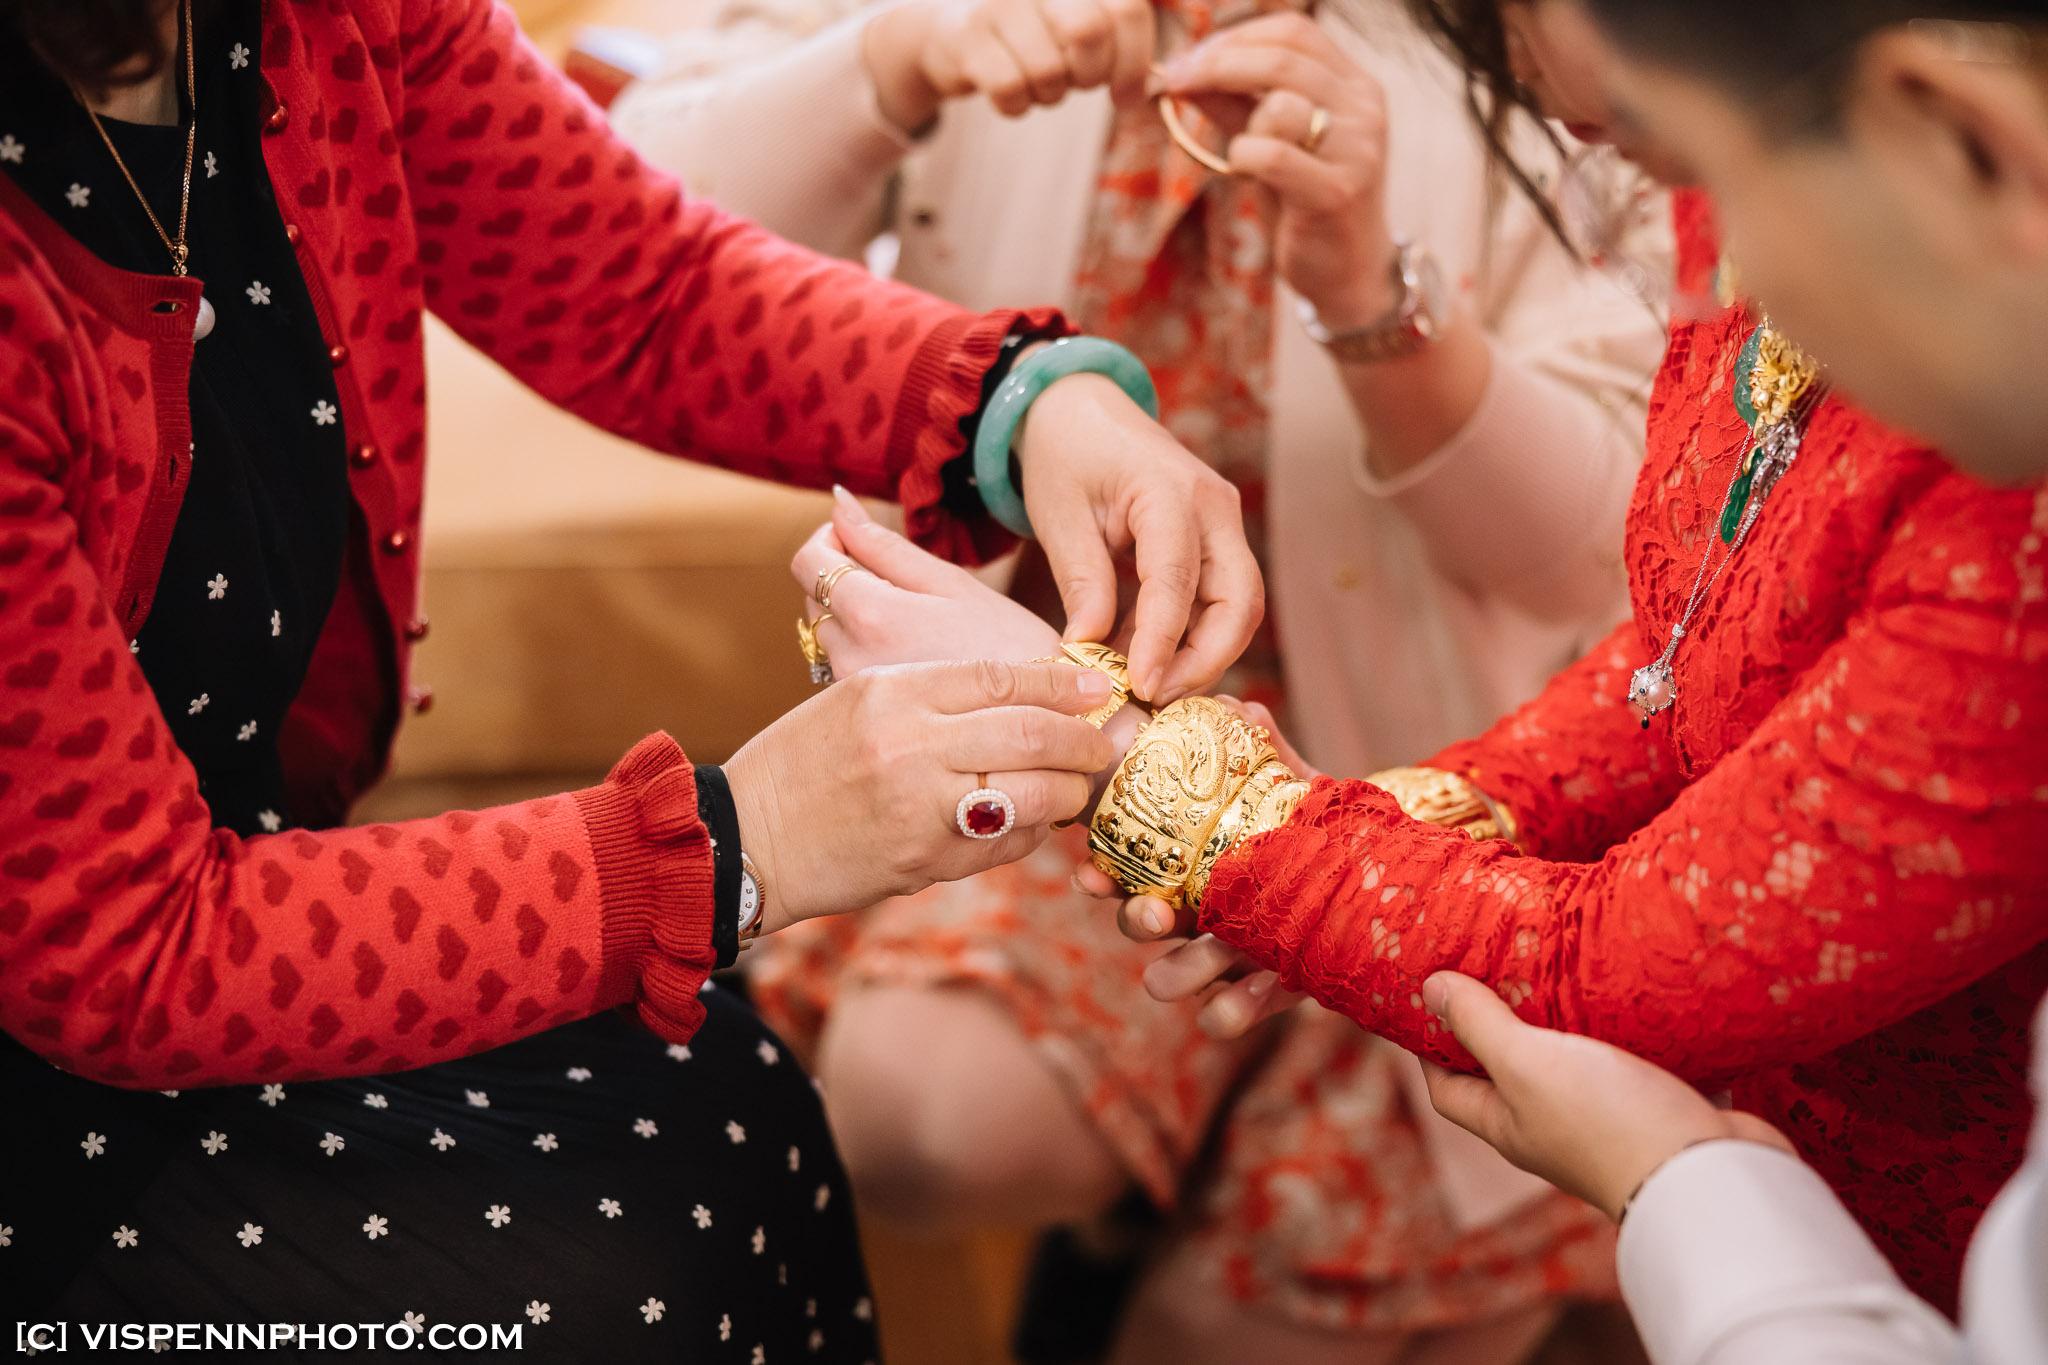 WEDDING DAY Photography Melbourne VISPENN 墨尔本 婚礼跟拍 婚礼摄像 婚礼摄影 结婚照 登记照 ElitaPB 02032 1P EOSR VISPENN